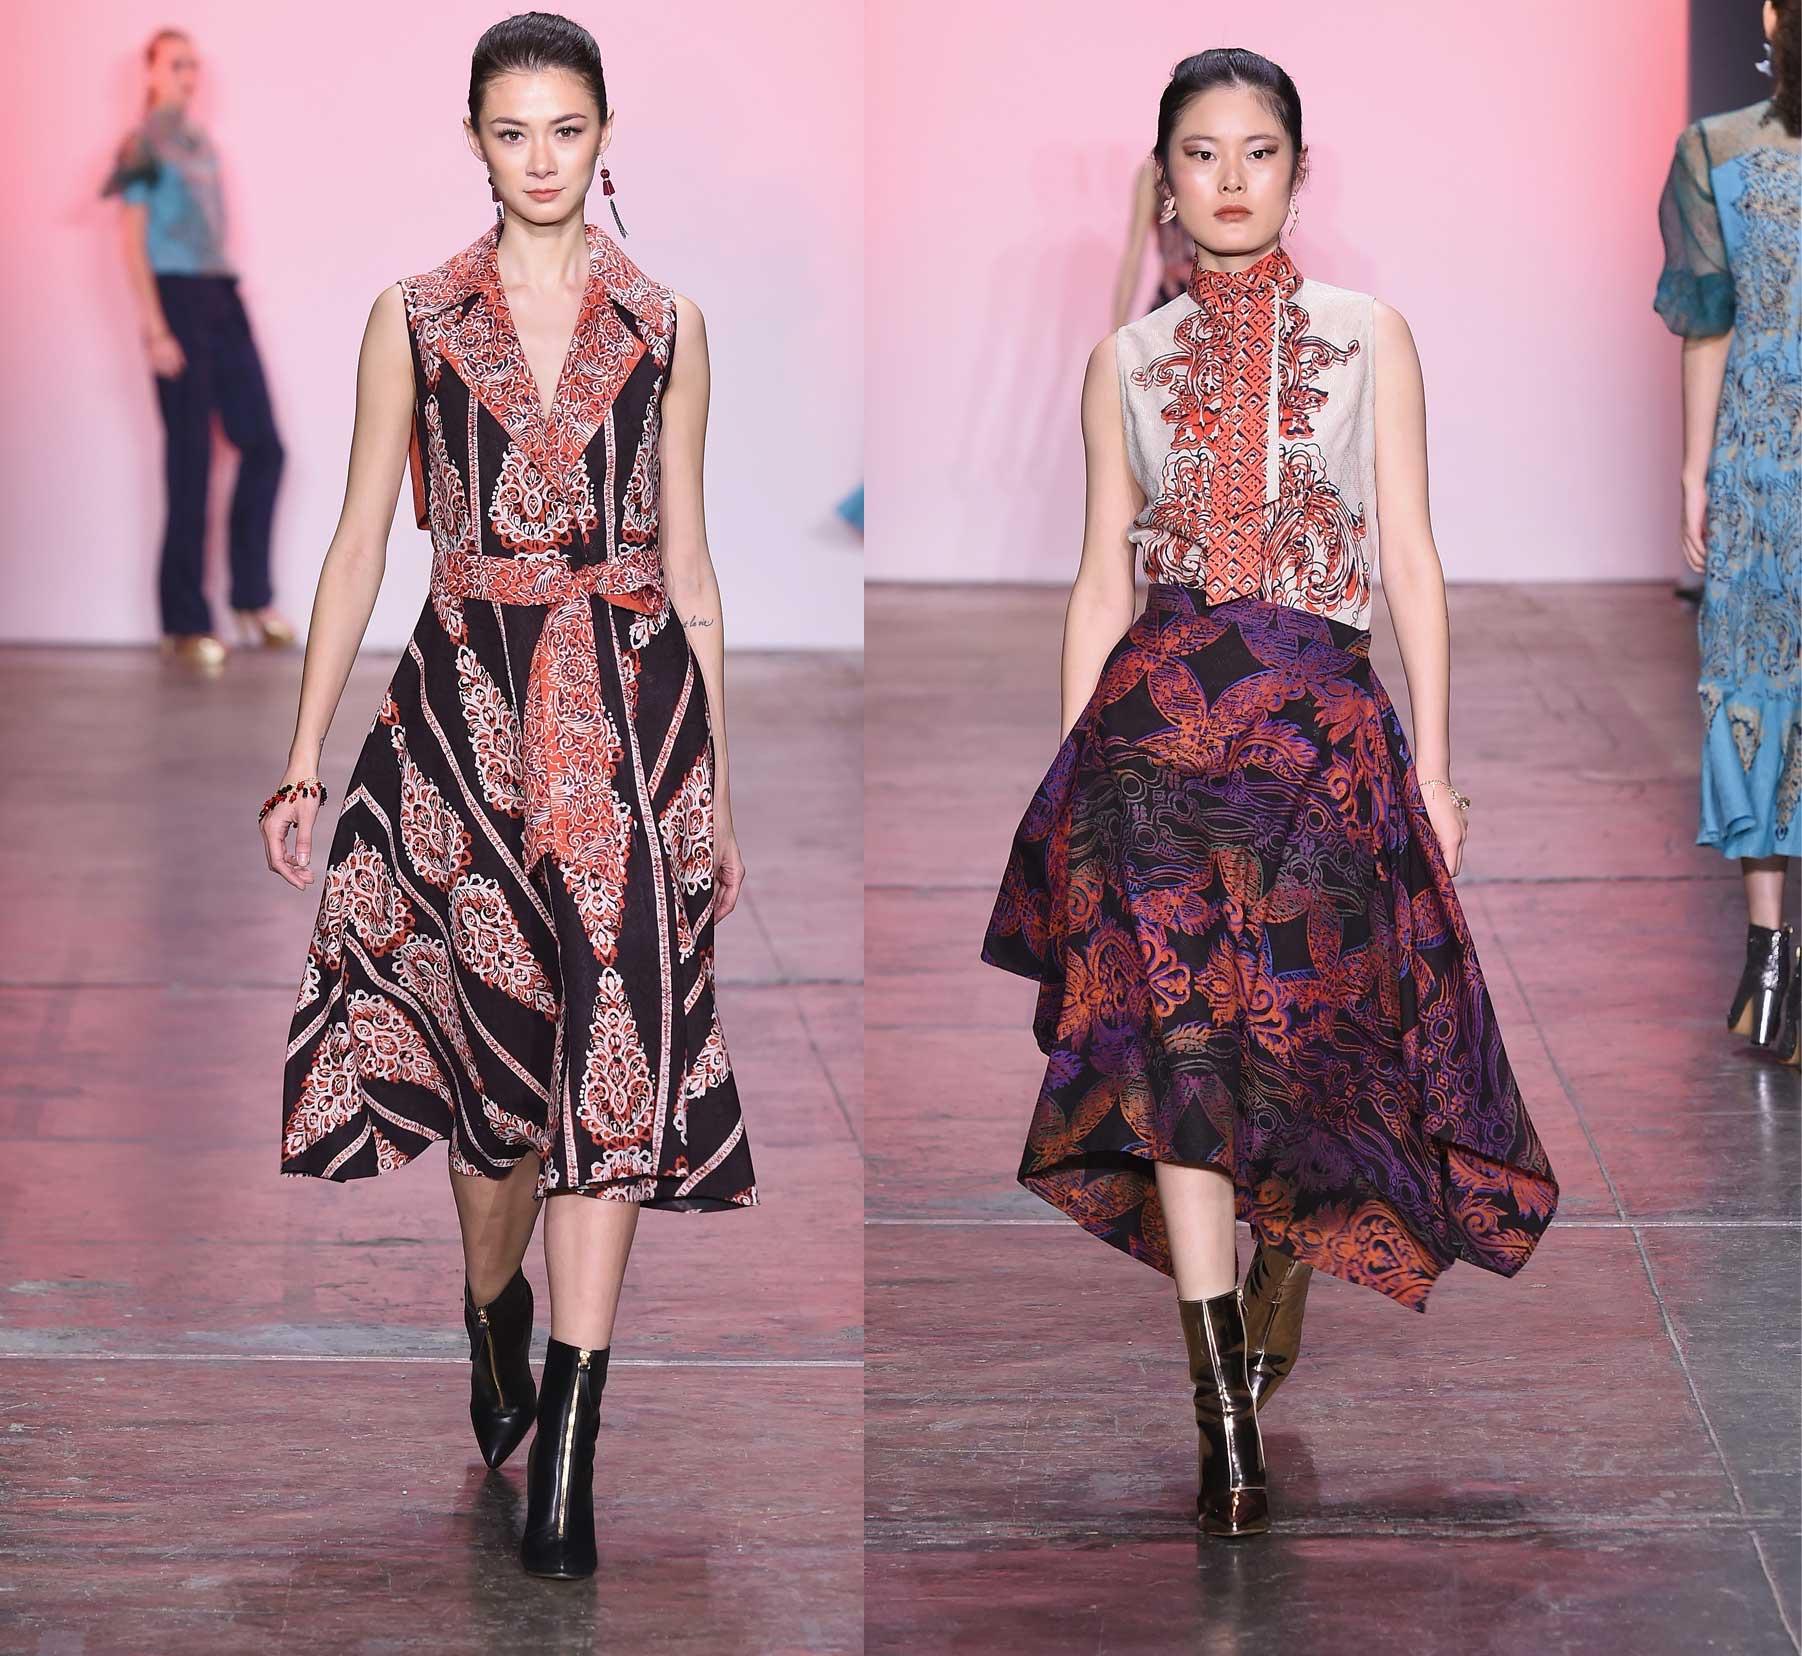 Model baju batik fashionista